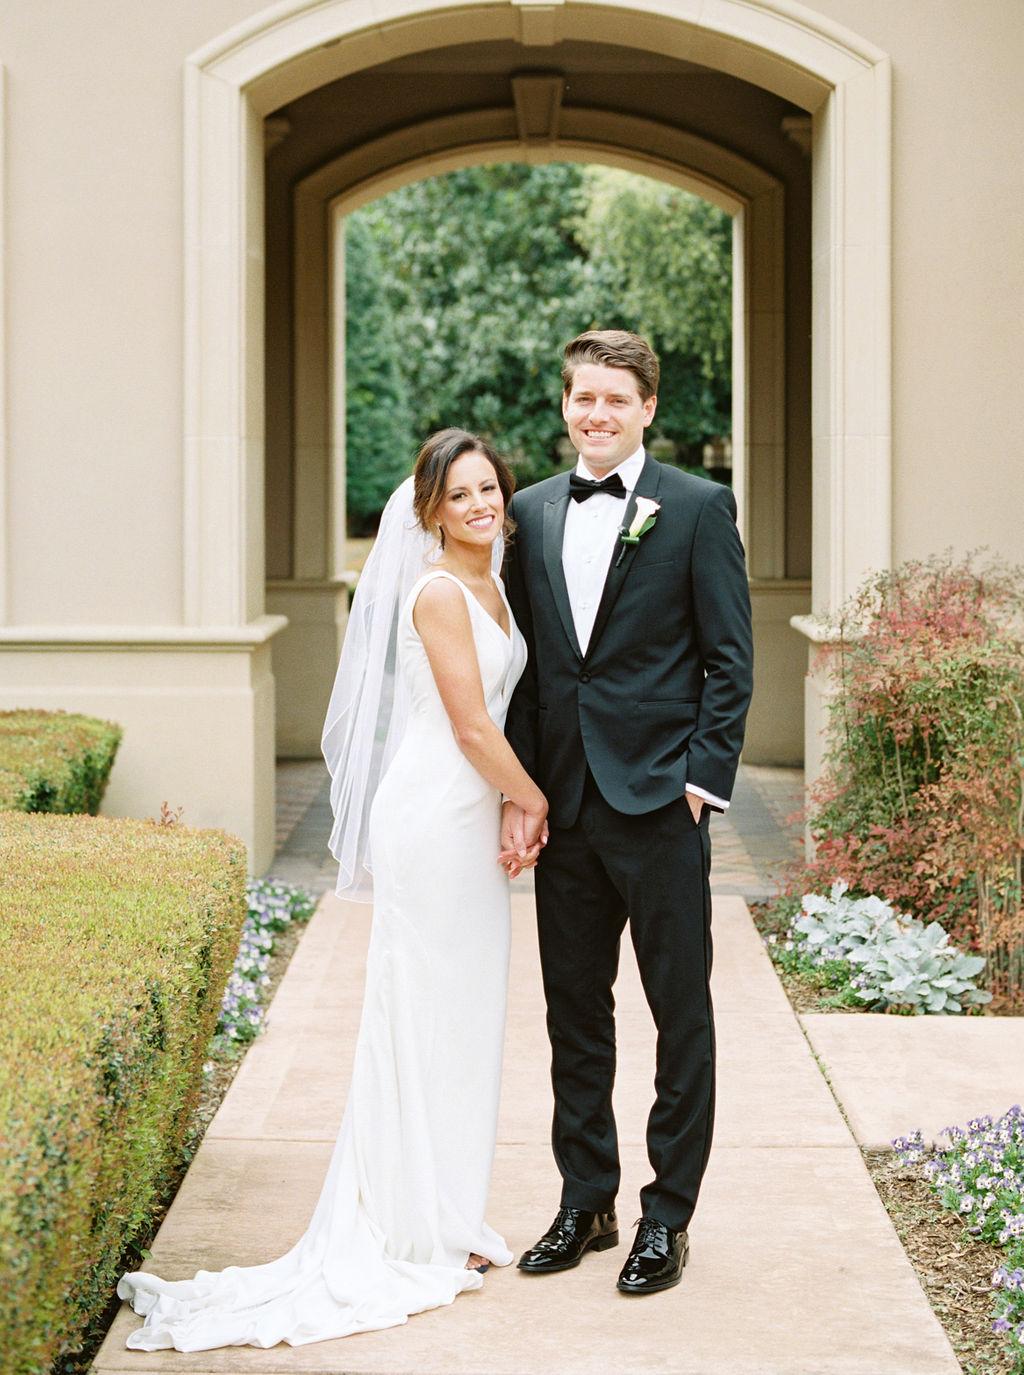 Austin-Film-Wedding-Photographer-Royal-Oaks-Country-Club-13.jpg